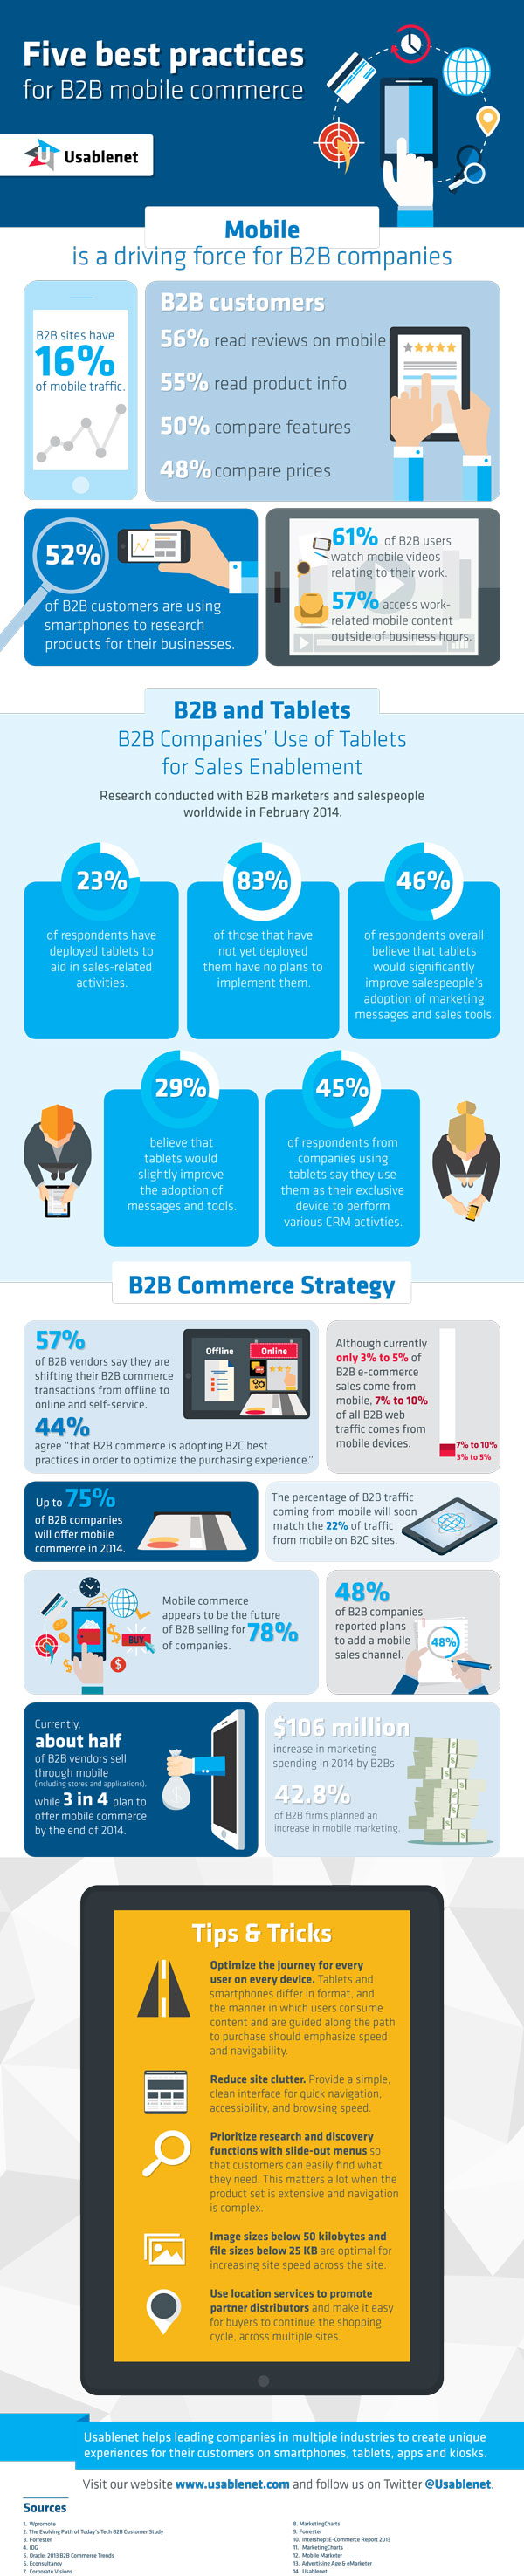 Mobile B2B 5 conseils et astuces